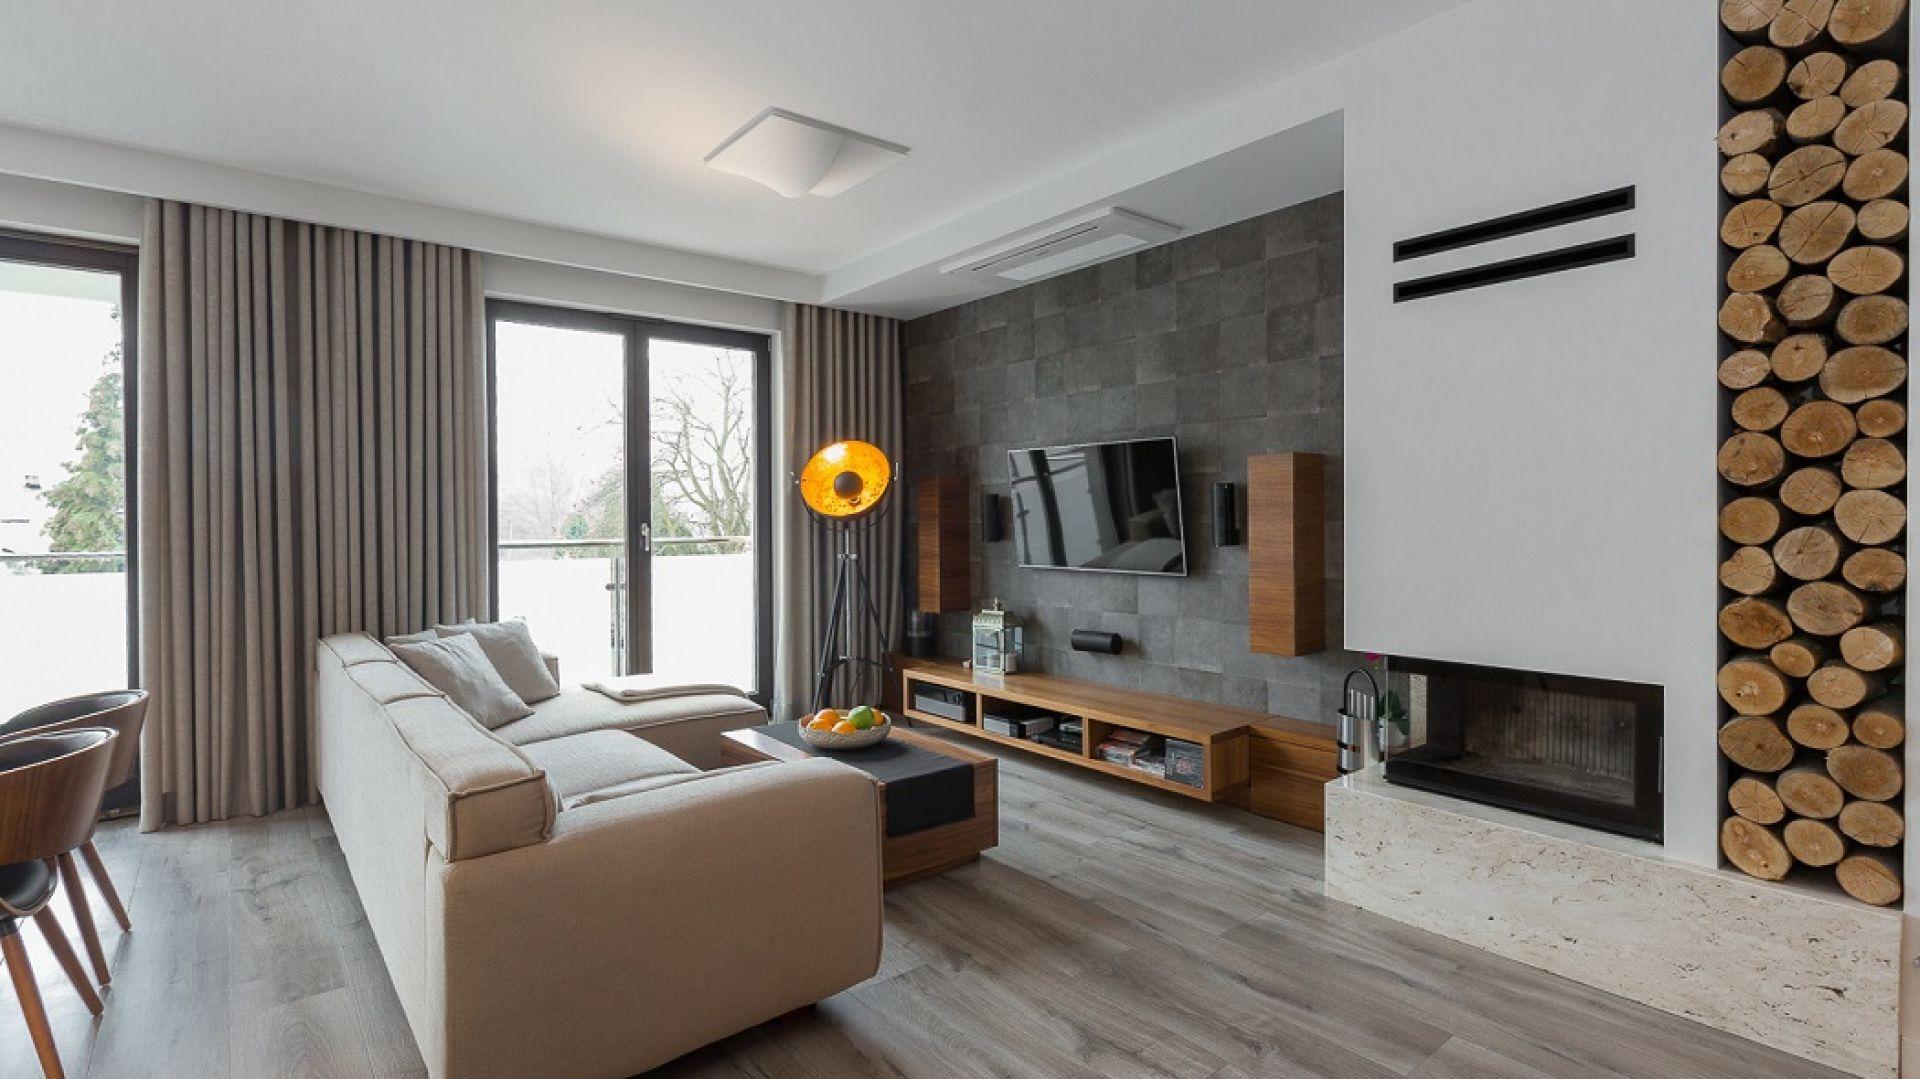 Apartament w kolorach ziemi. Projekt: Archissima